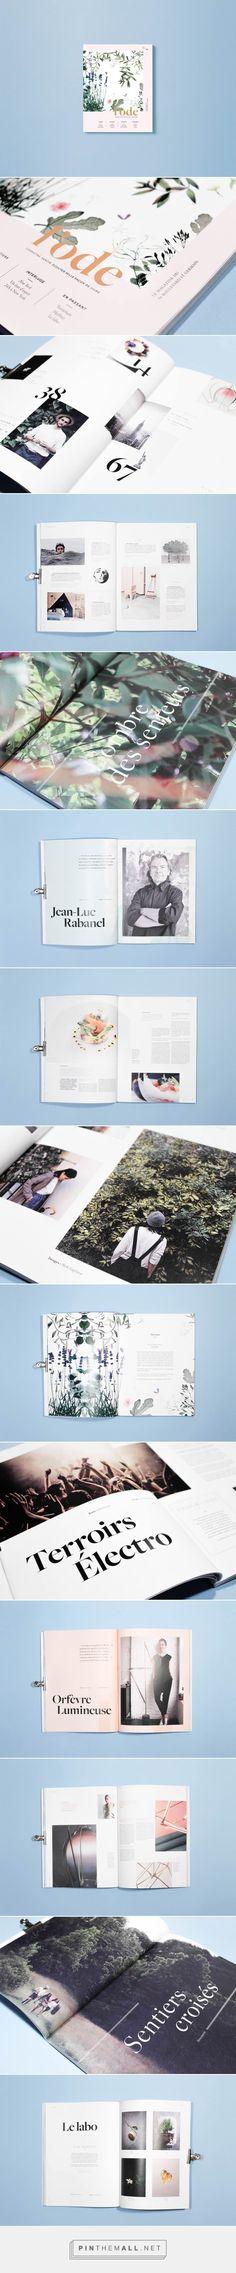 Editorial Design Inspiration: l'ode Magazine   Abduzeedo Design Inspiration - created via http://pinthemall.net